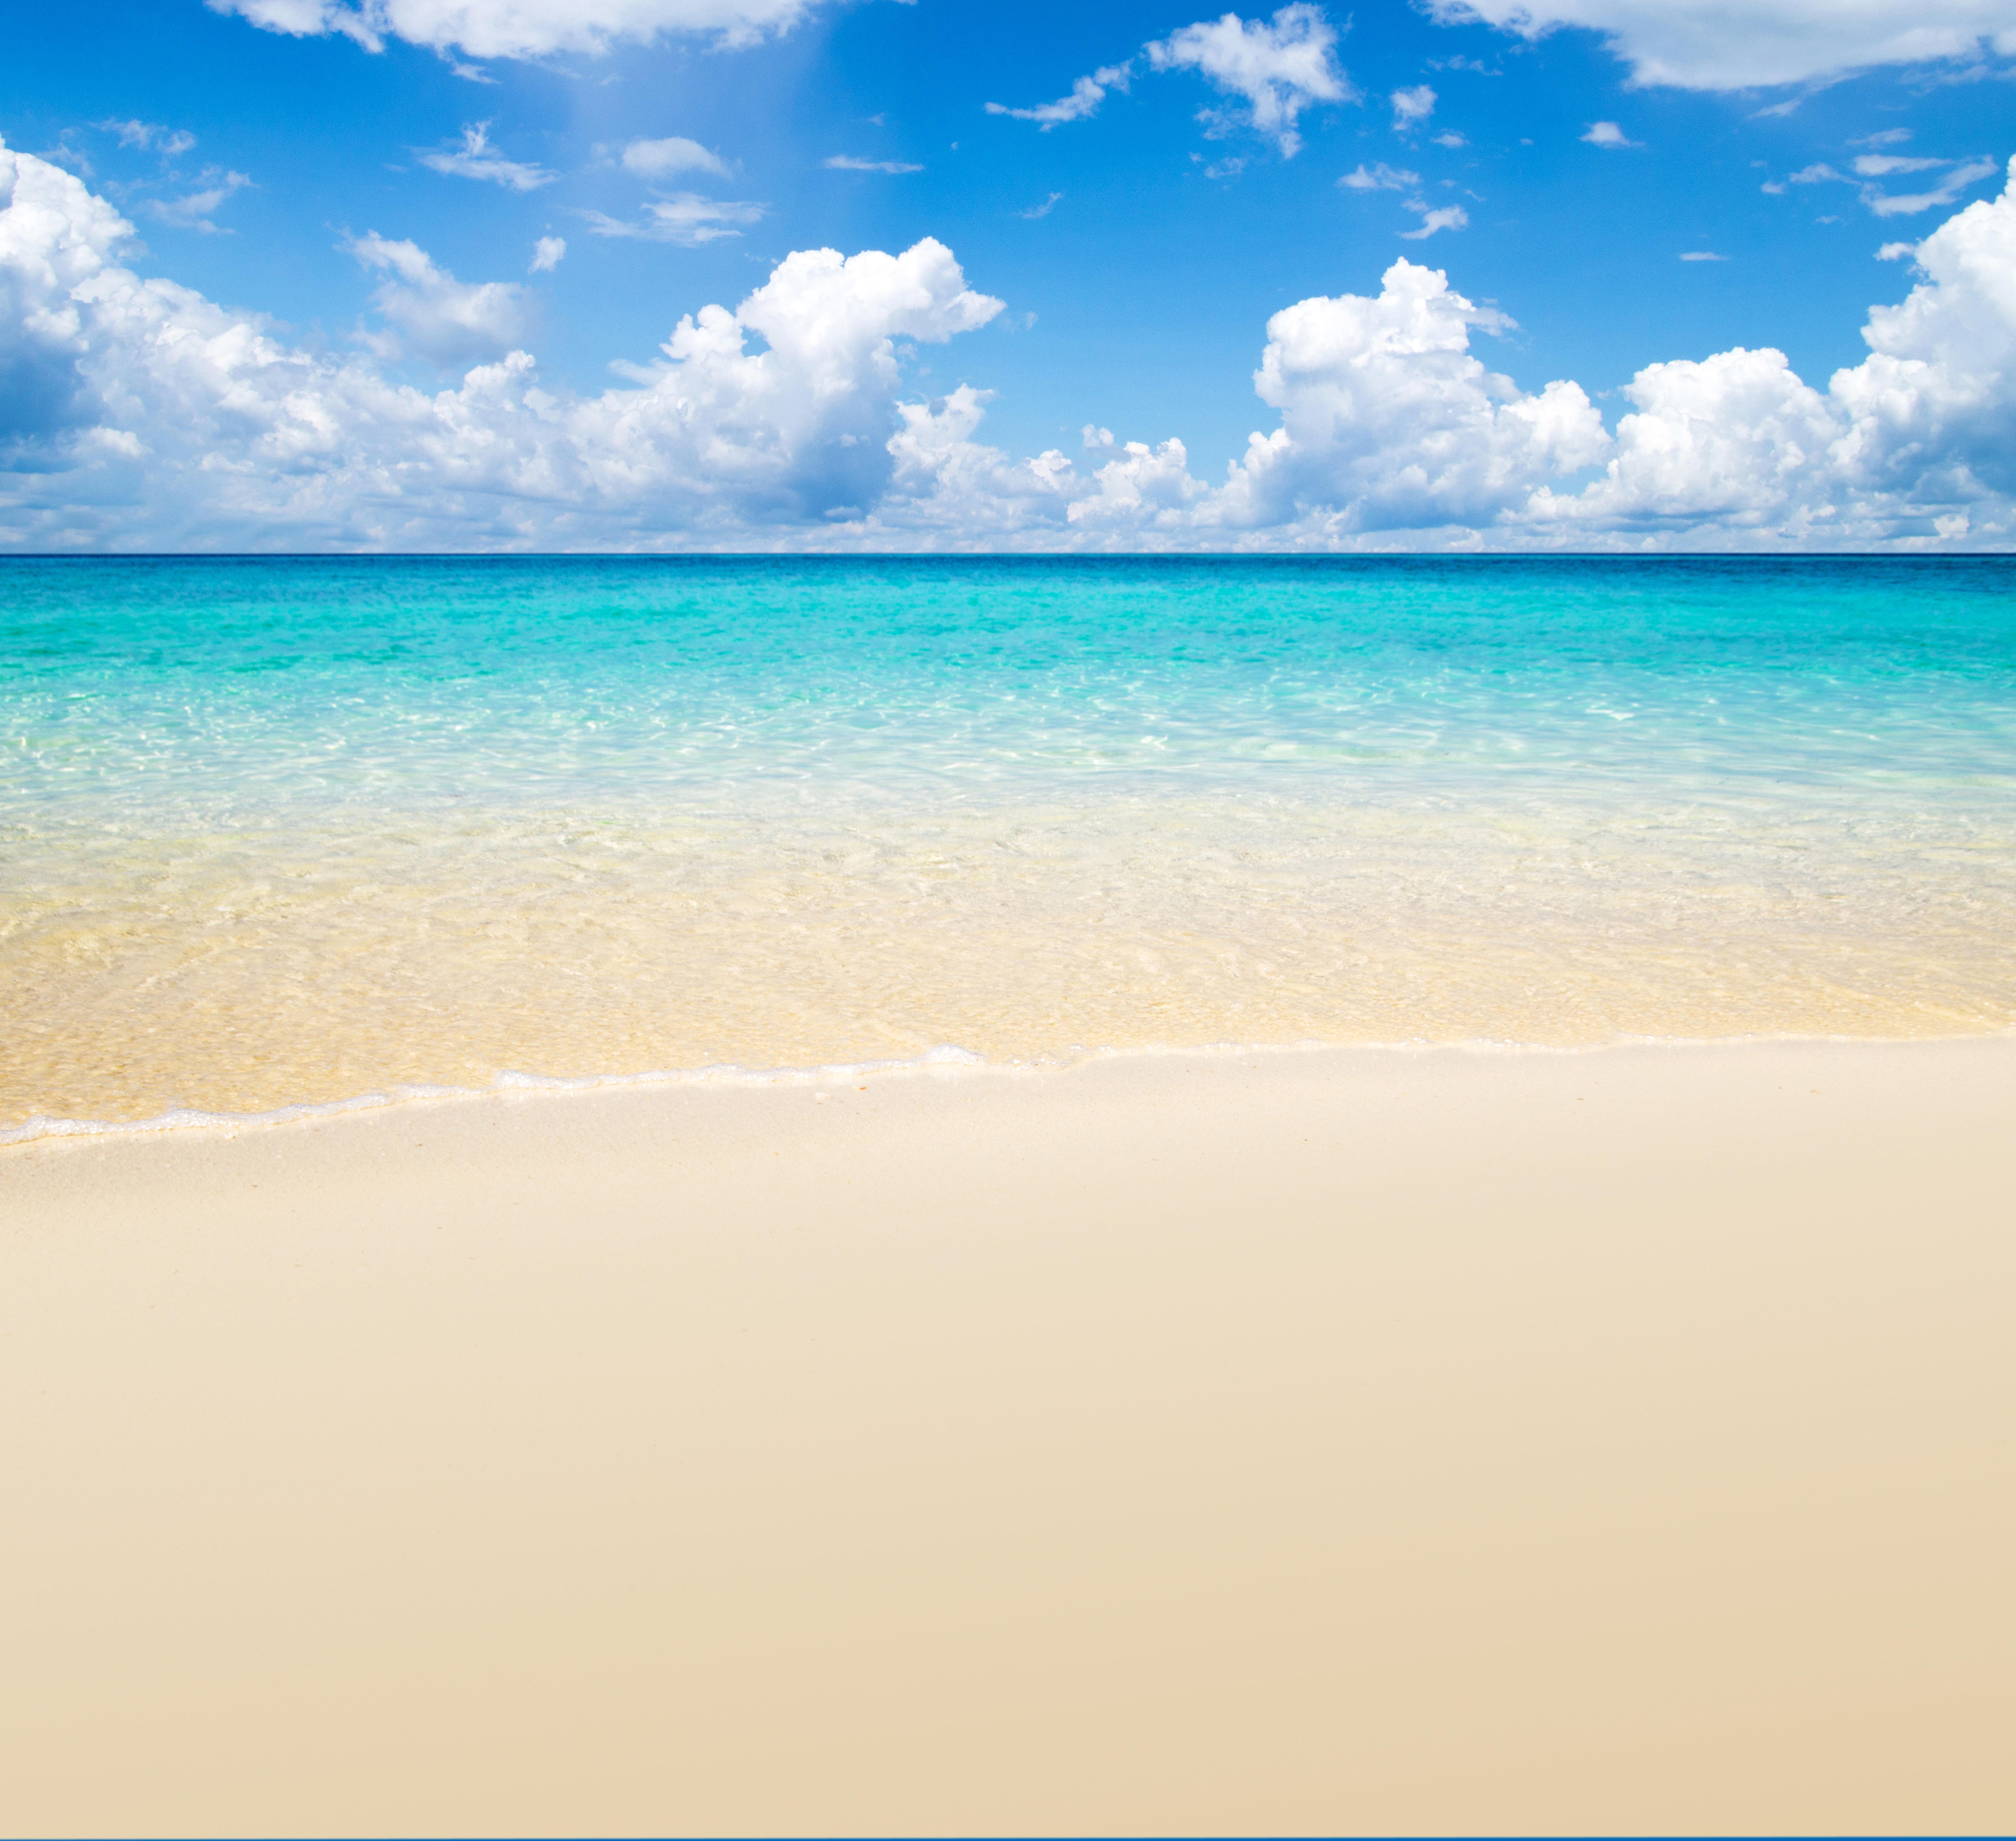 Summer Beach Background | Gallery Yopriceville - High-Quality ...